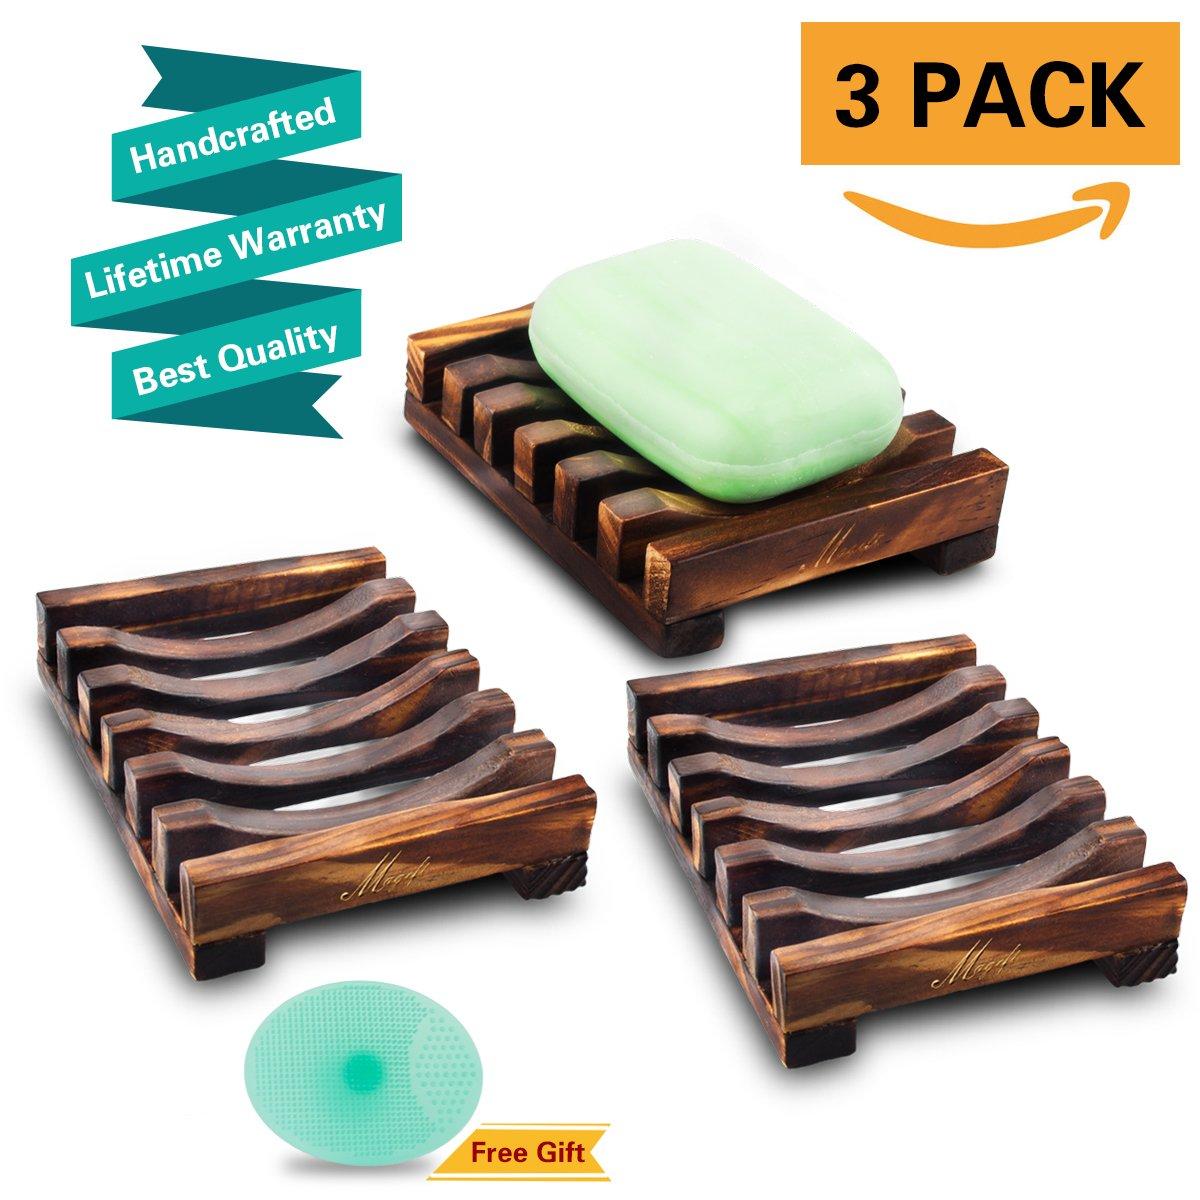 Magift 2 Piece Bathroom Wooden Soap Case Holder, Sink Deck Bathtub Shower Dish, Rectangular, Hand Craft, Natural Wooden Holder for Sponges, Scrubber l007